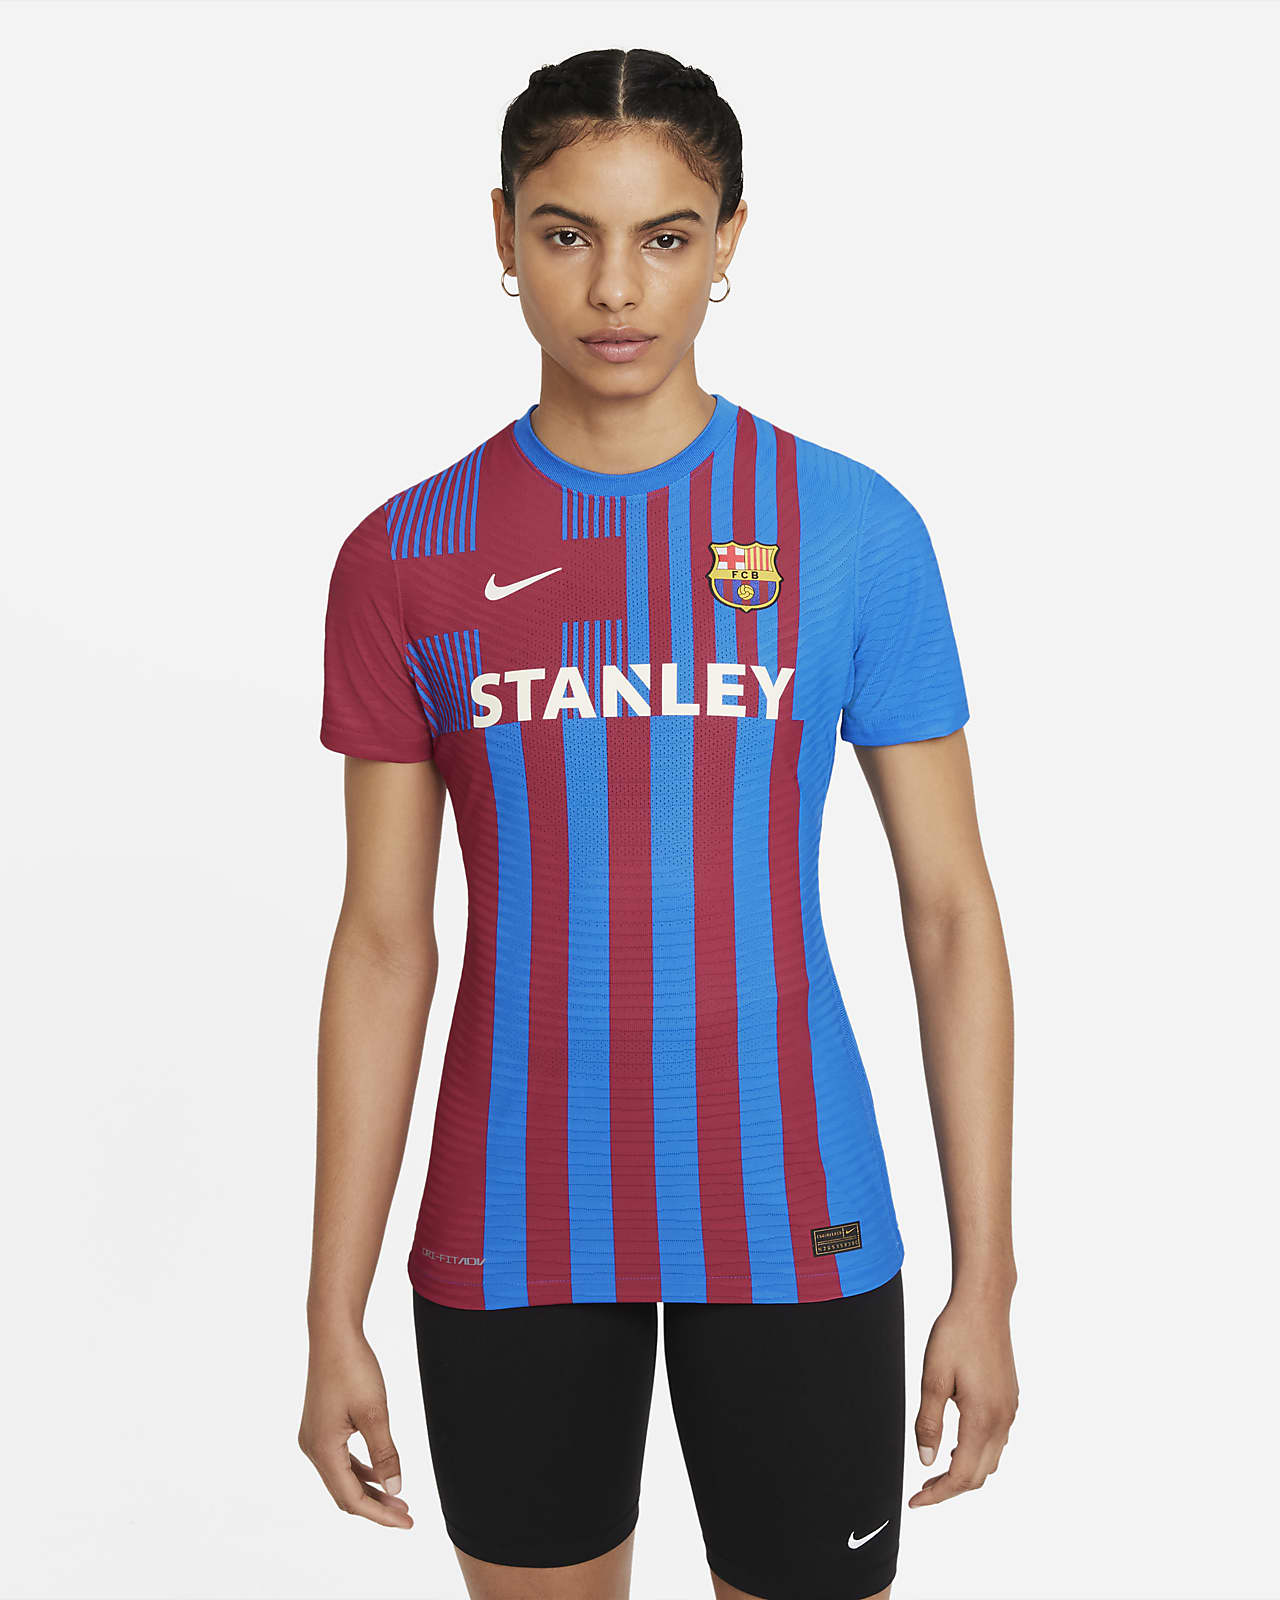 Camiseta de fútbol de local Nike Dri-FIT ADV para mujer Match del FC Barcelona 2021/22